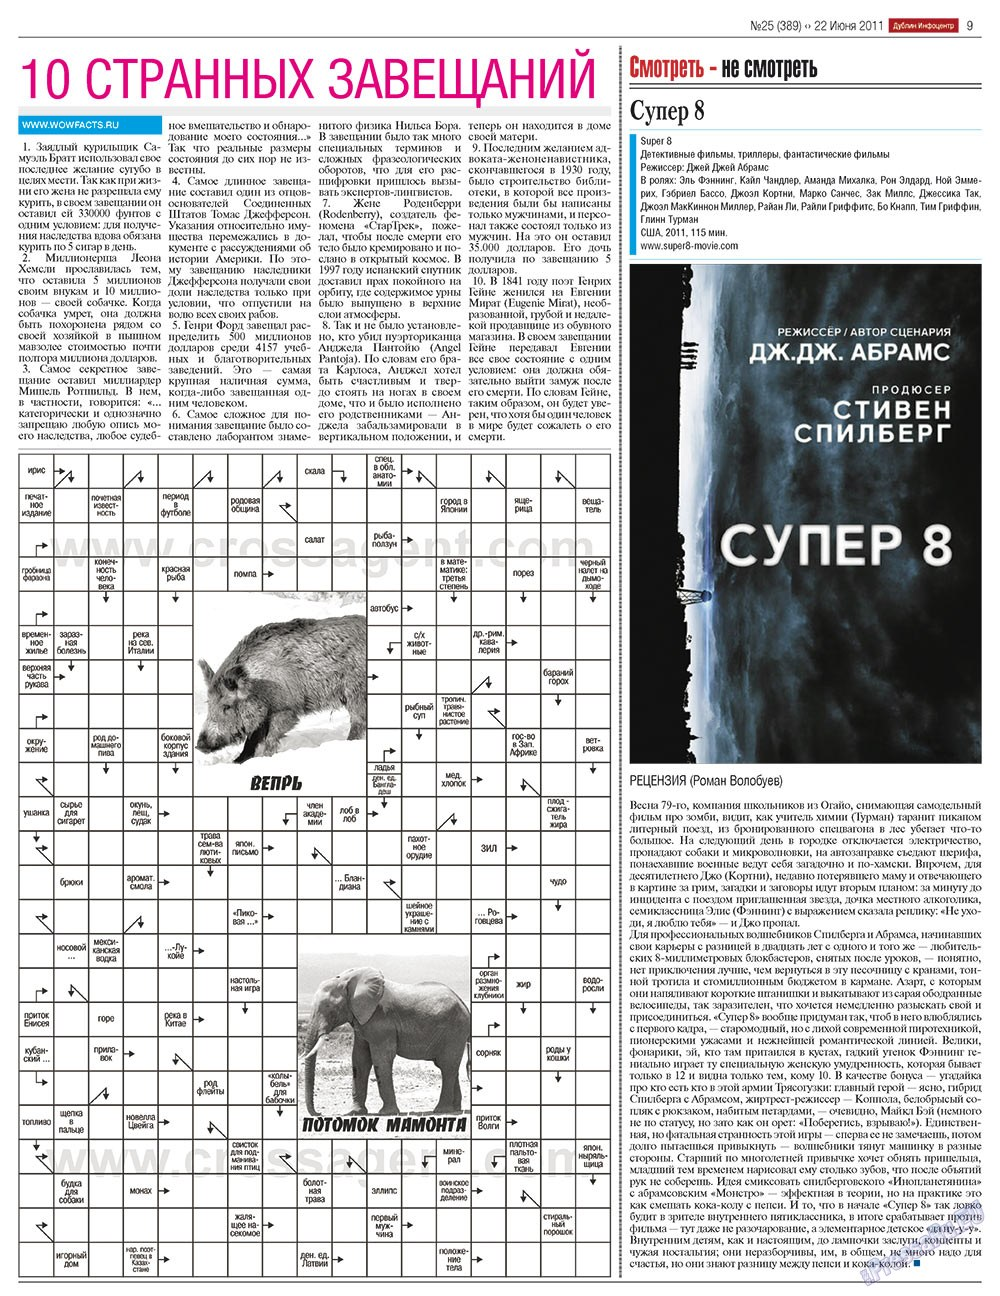 Дублин инфоцентр (газета). 2011 год, номер 25, стр. 9